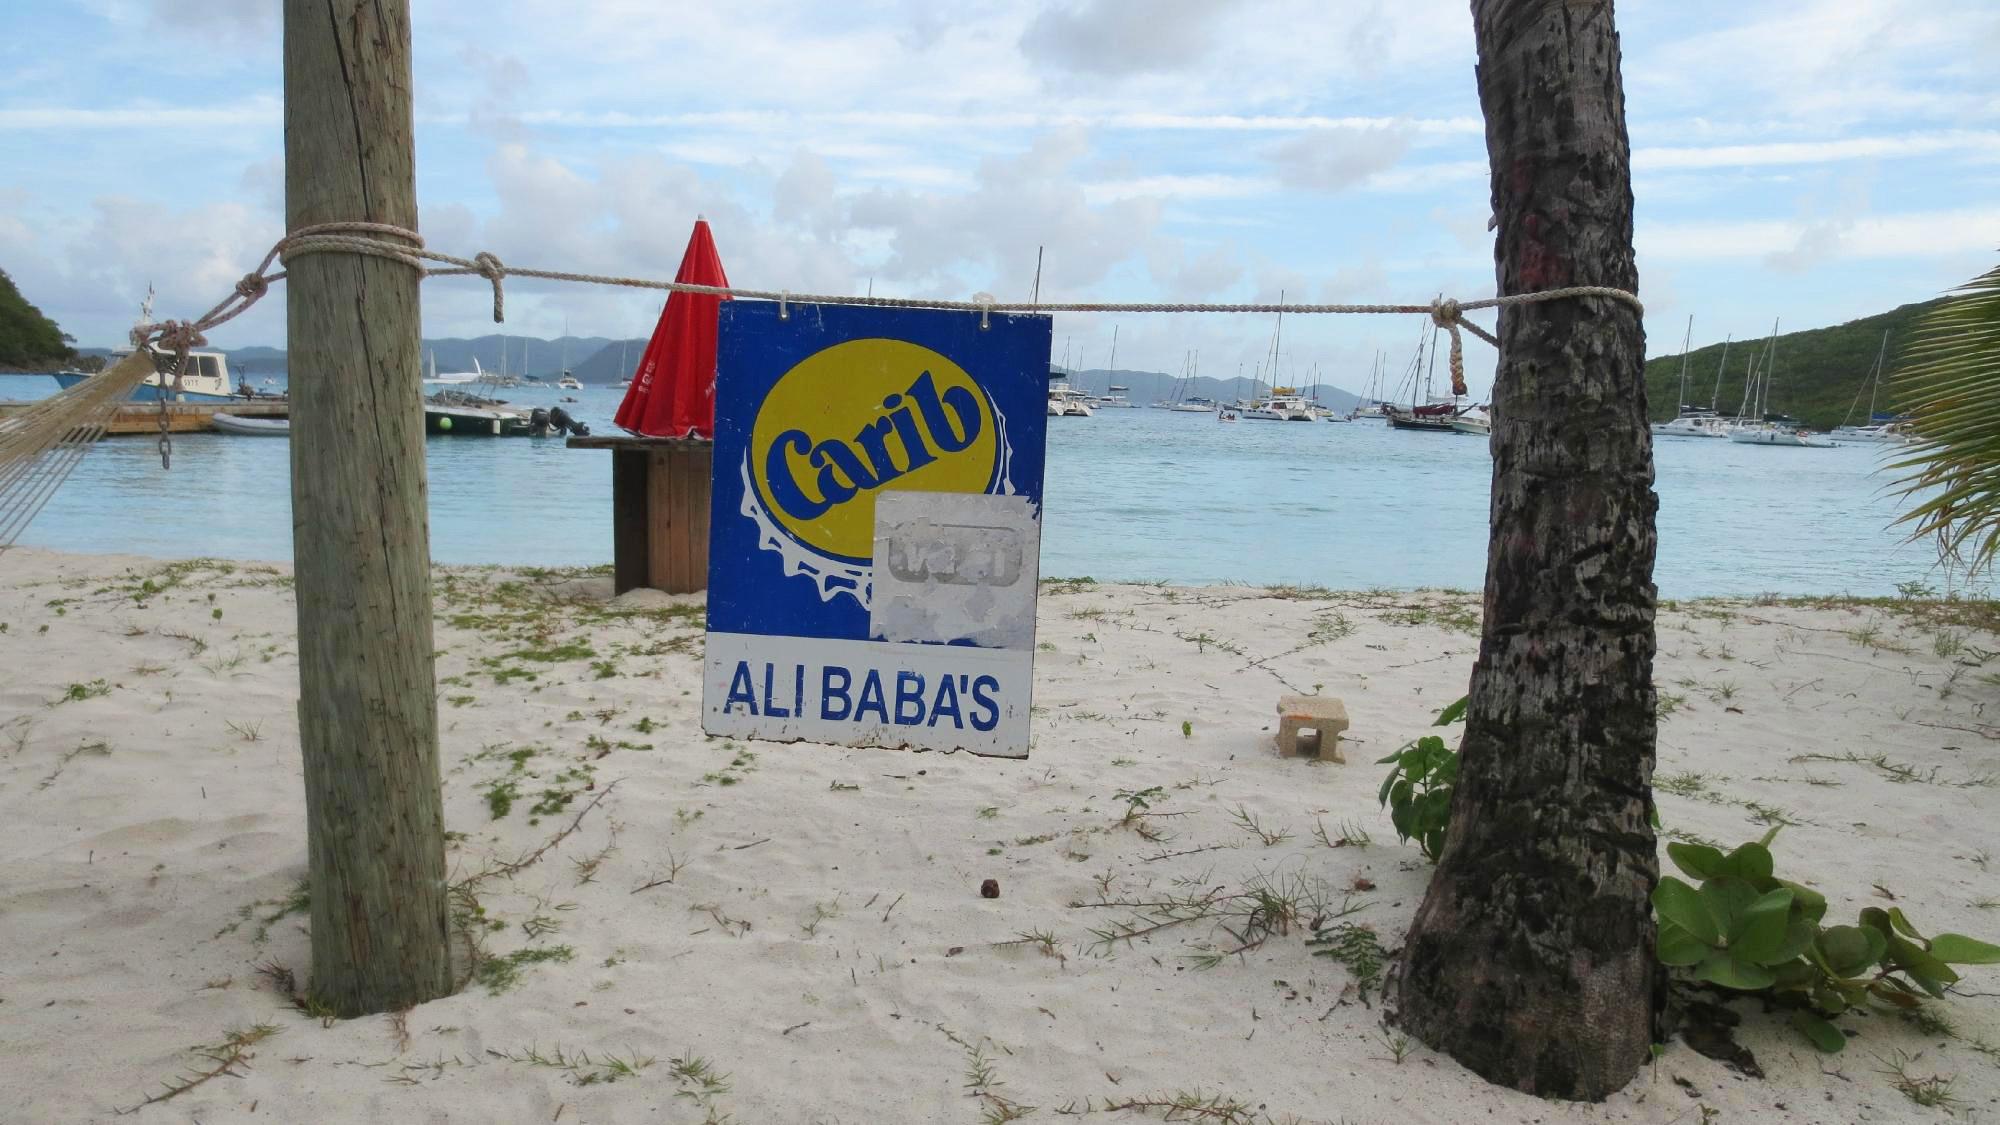 Ali Babas Bar & Restaurant